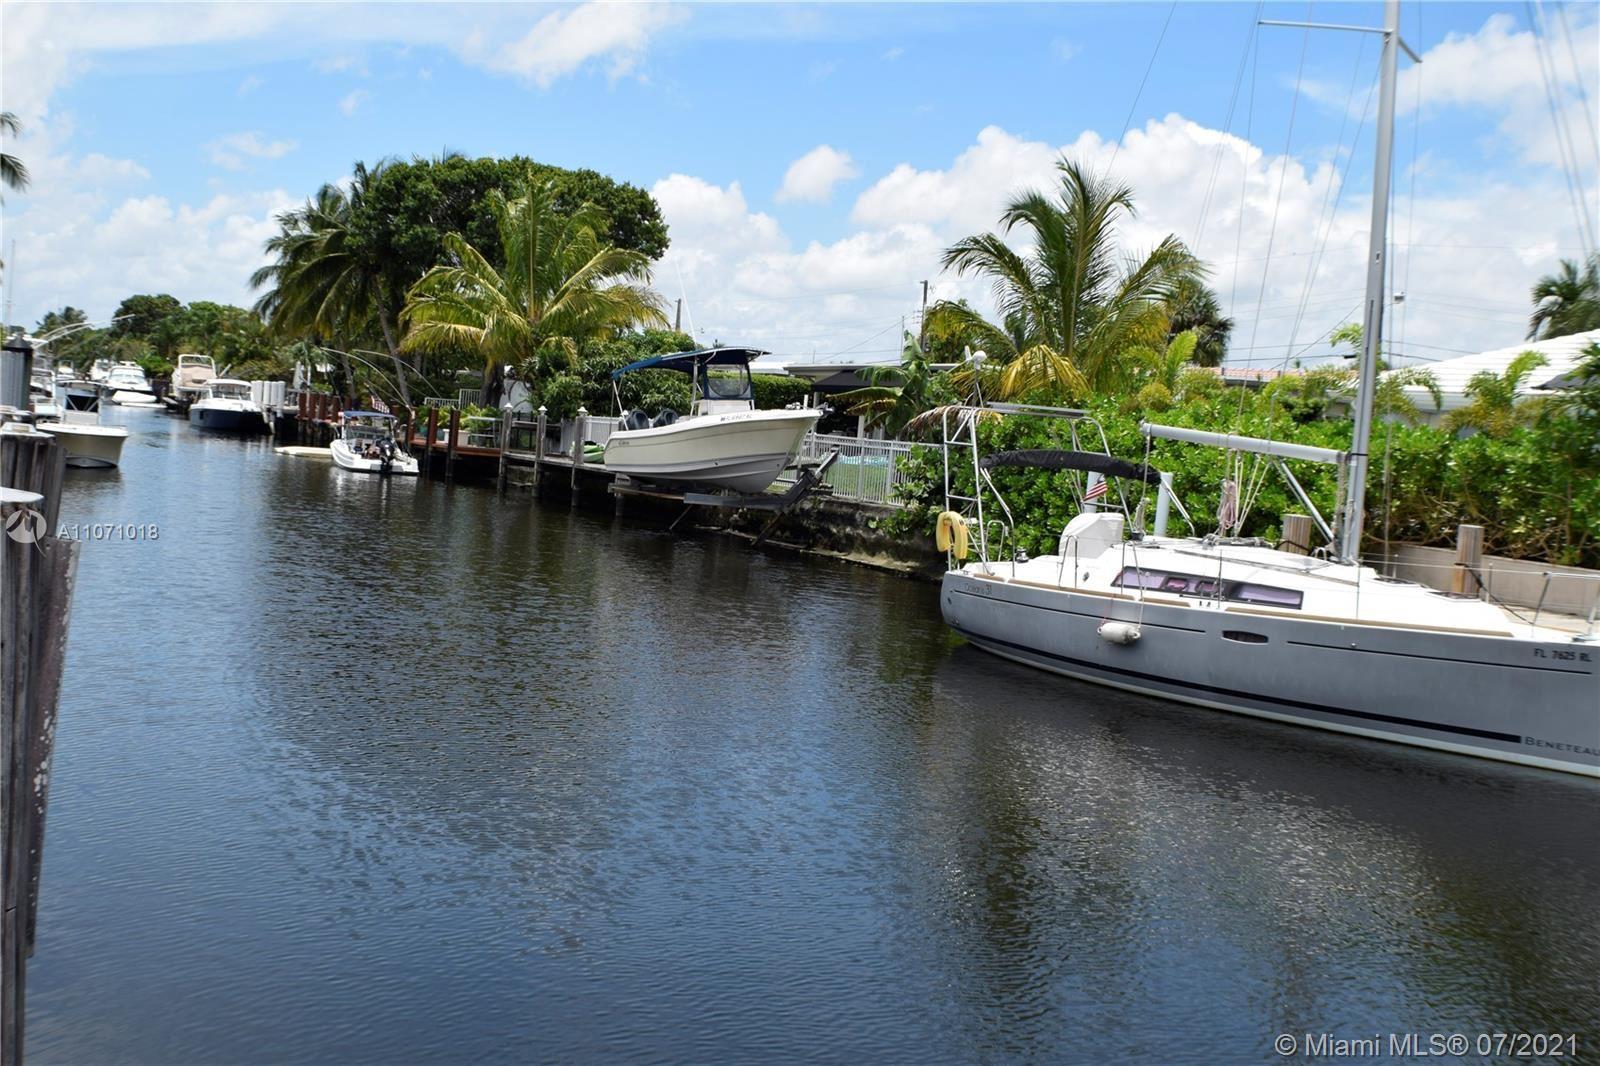 1005 Mango Isle, Fort Lauderdale, FL 33315 - #: A11071018